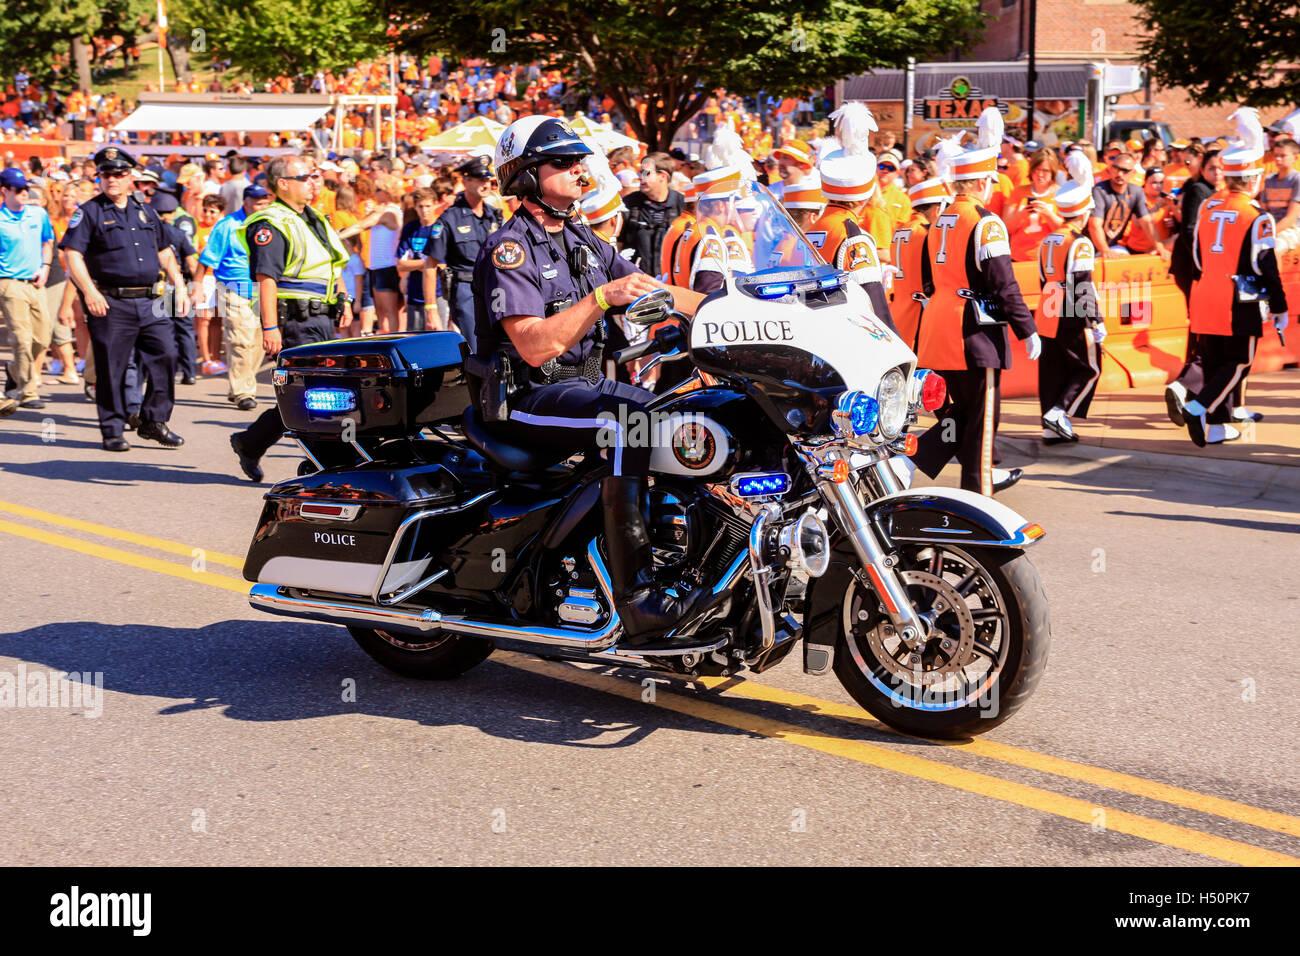 Motorcycle Escort Stock Photos & Motorcycle Escort Stock Images - Alamy